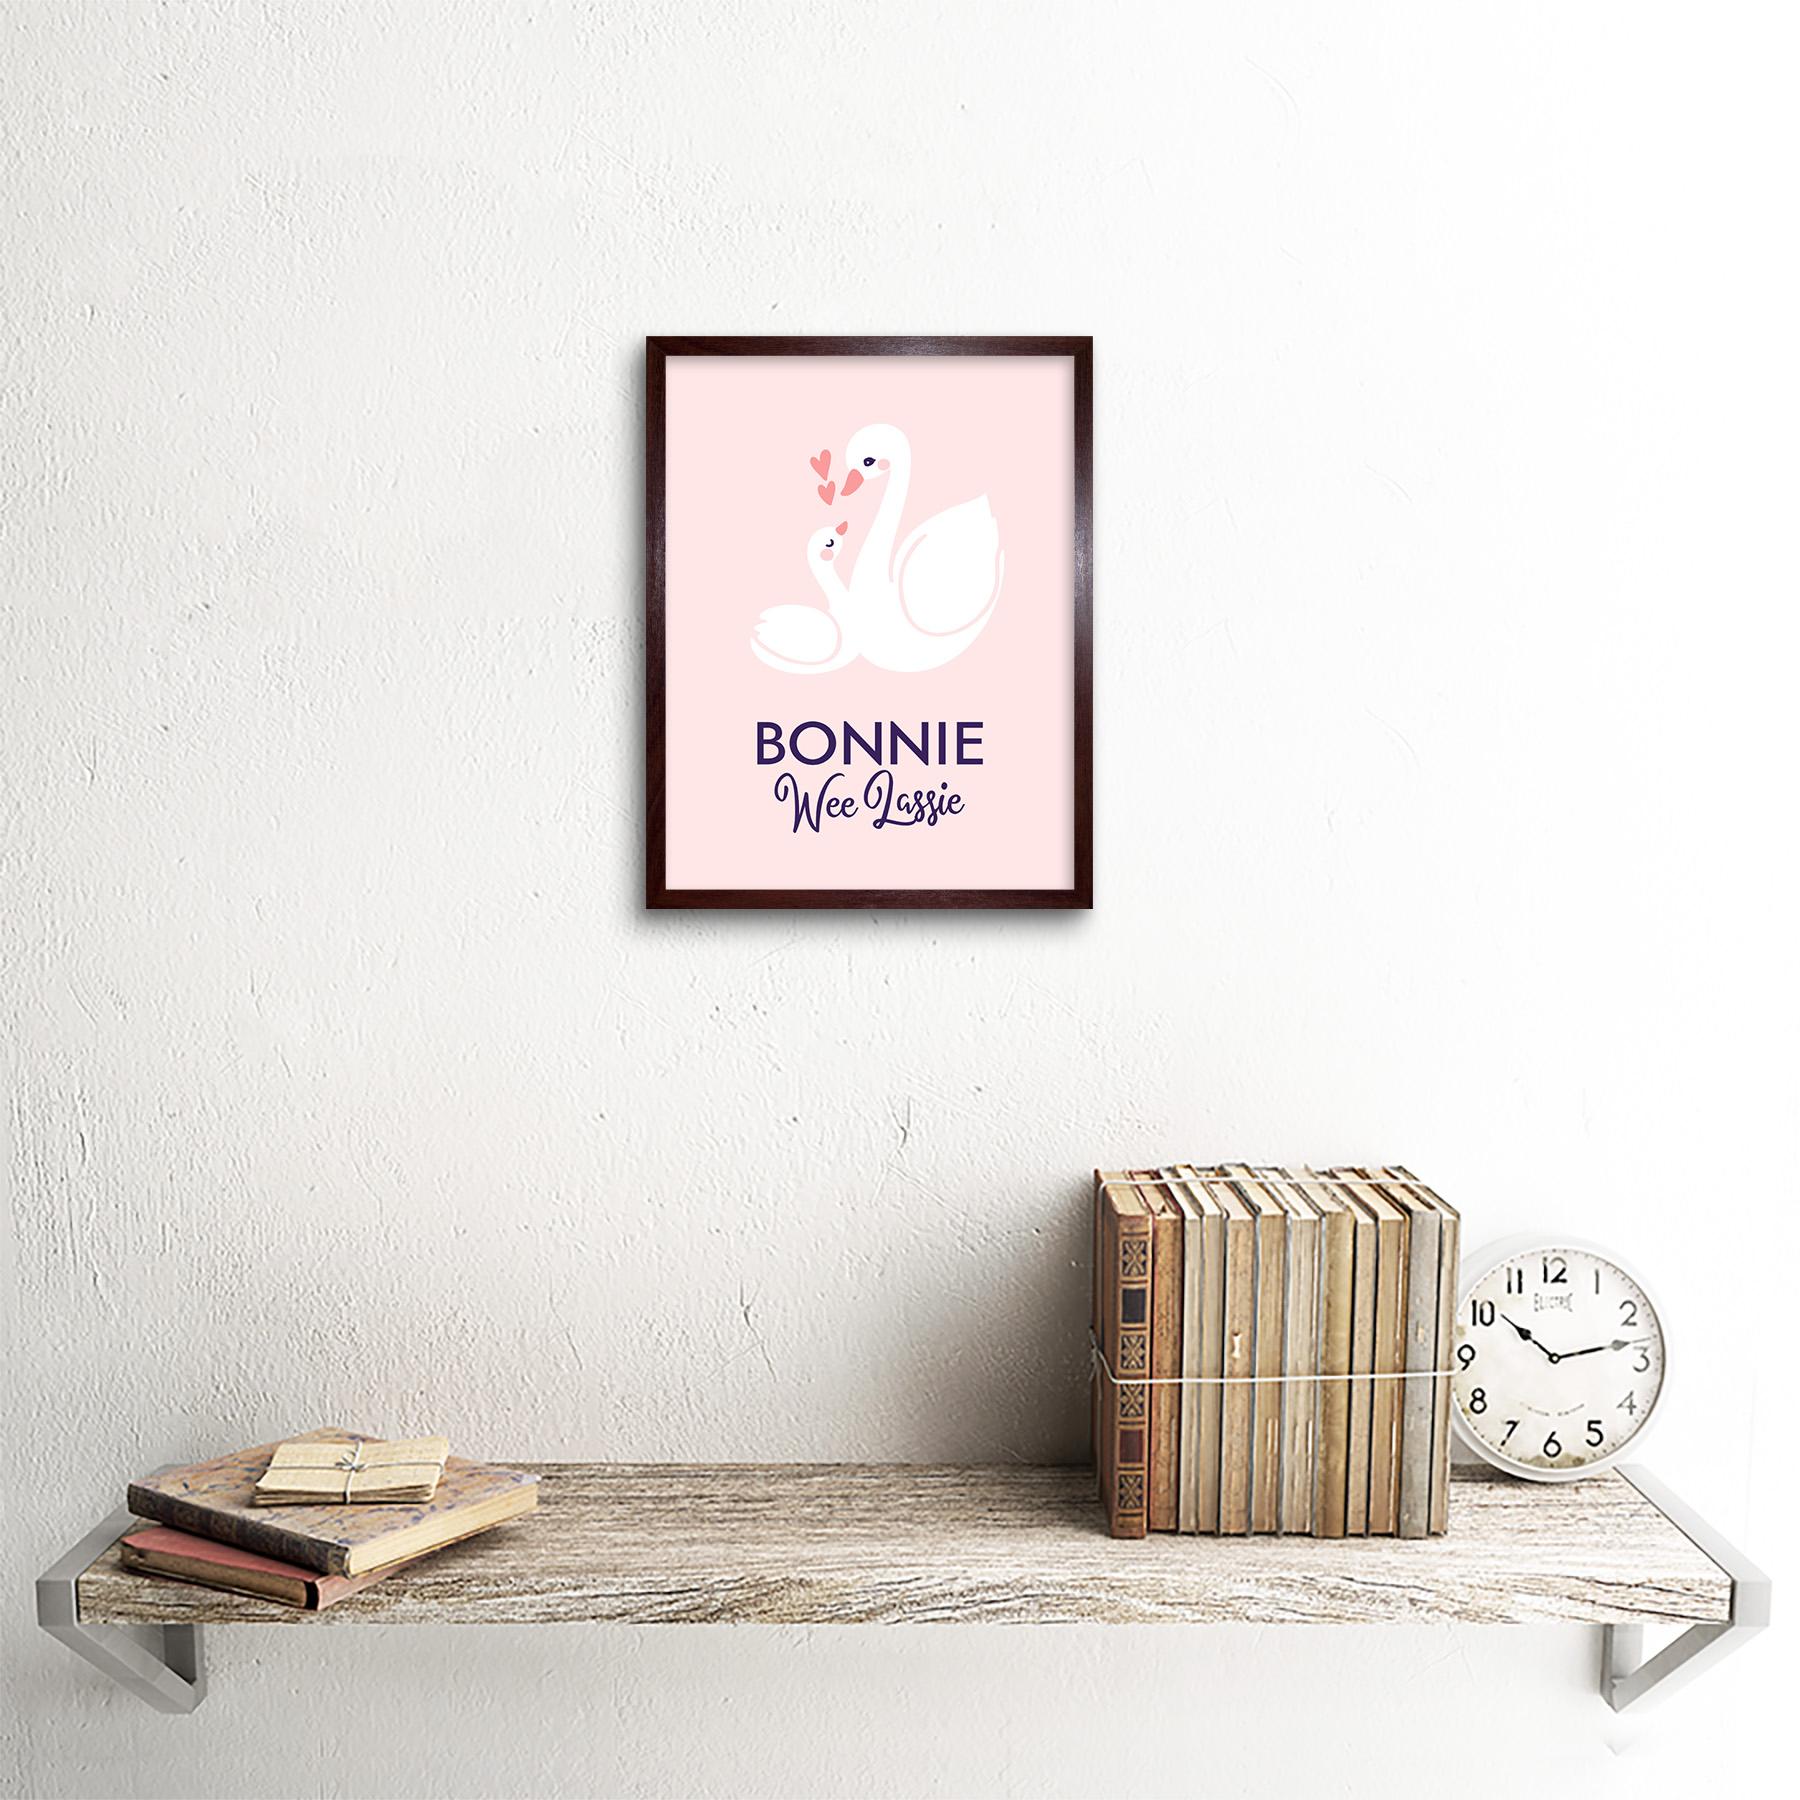 thumbnail 8 - Bonnie Wee LASSIE New Baby Girl Scottish Swan Framed Wall Art Print 9x7